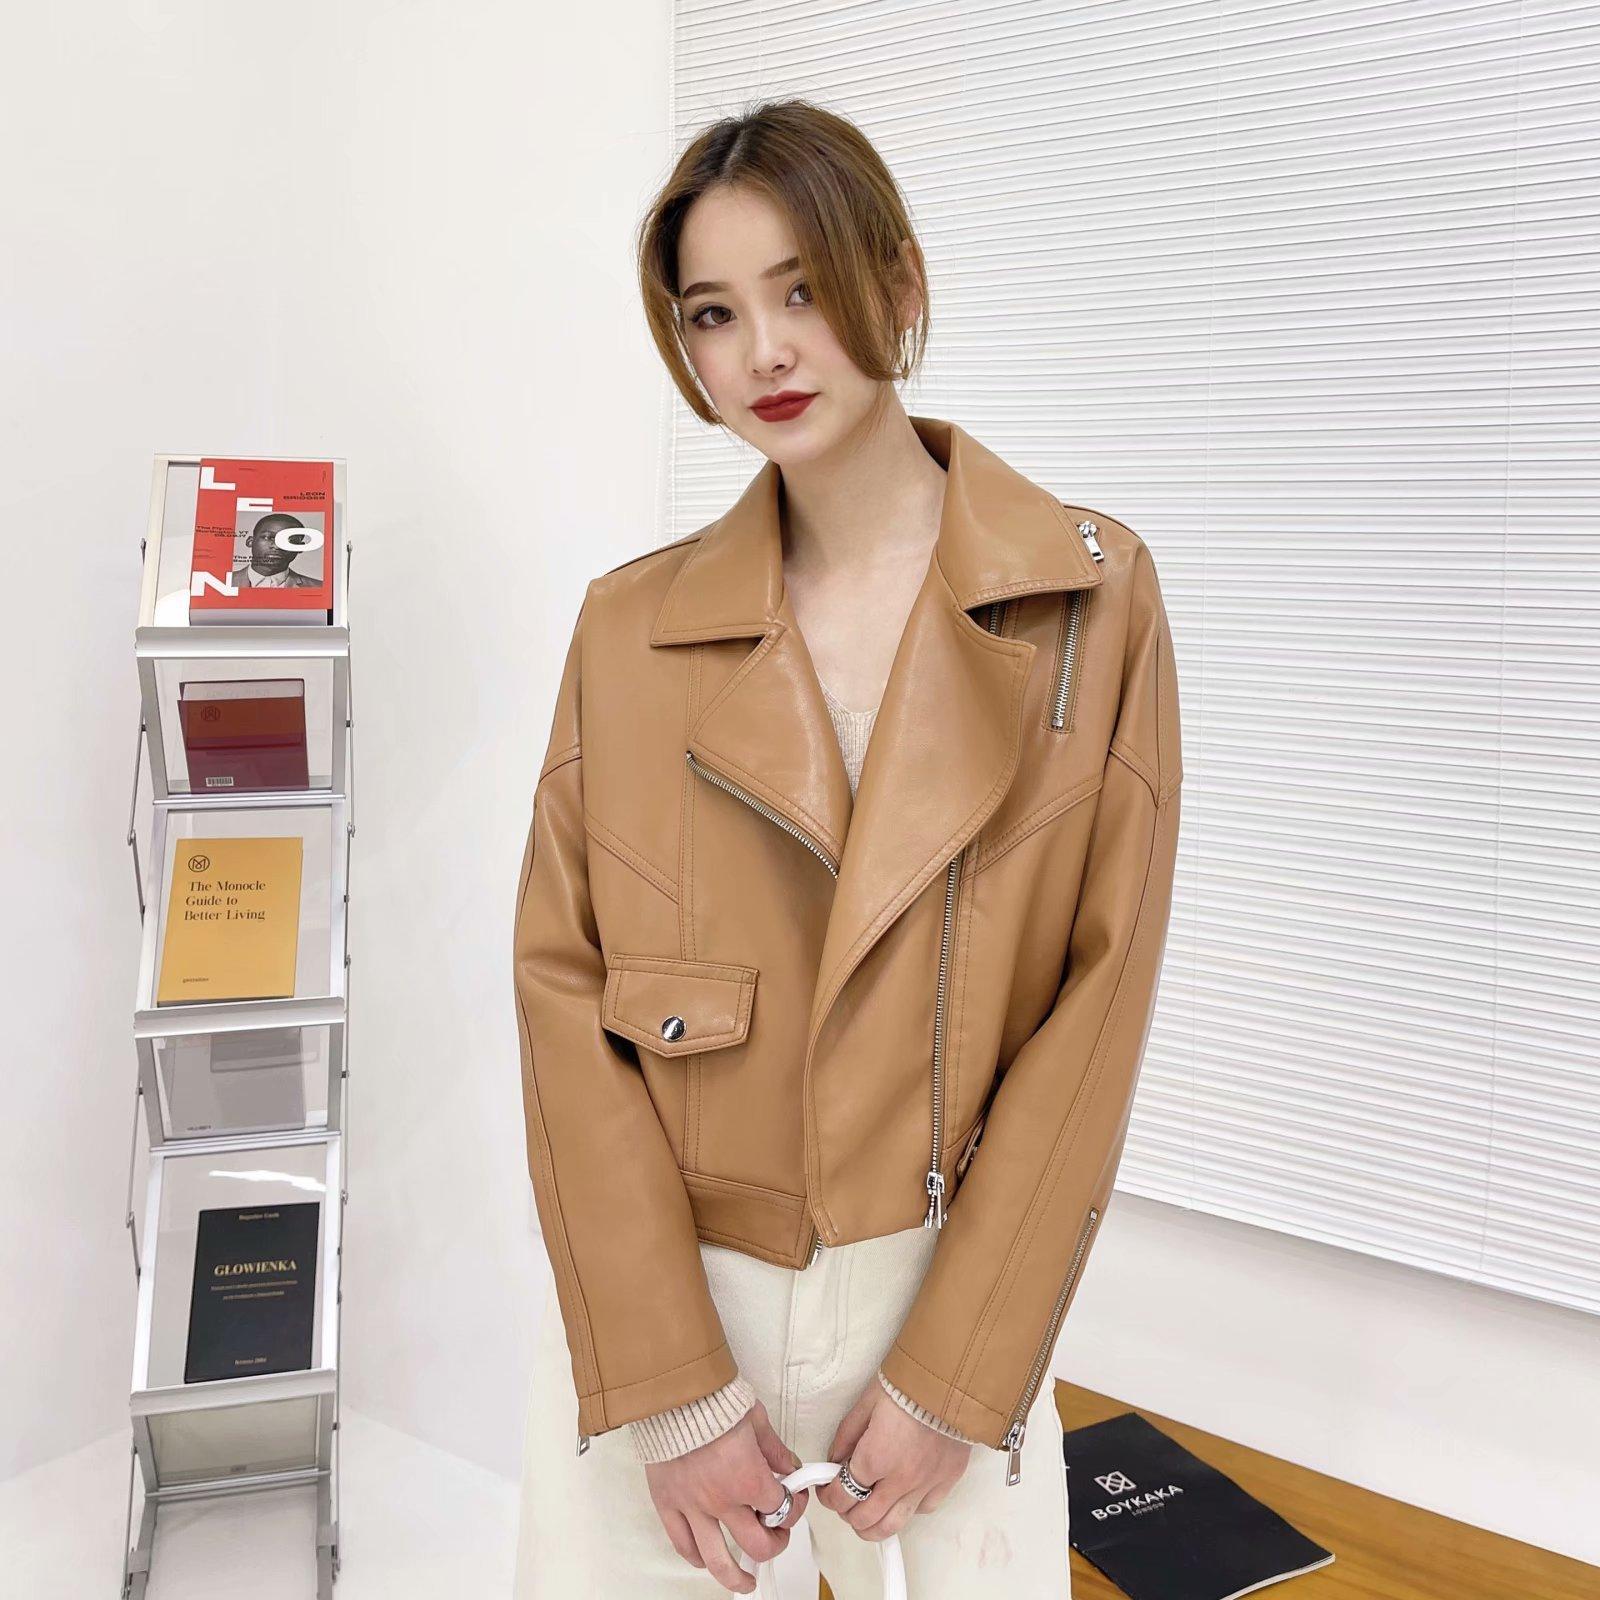 Casual PU Faux Leather Jacket Women Loose Short Biker Jackets Outwear Female Tops BF Style Black Leather Jacket Coat Fashion 2